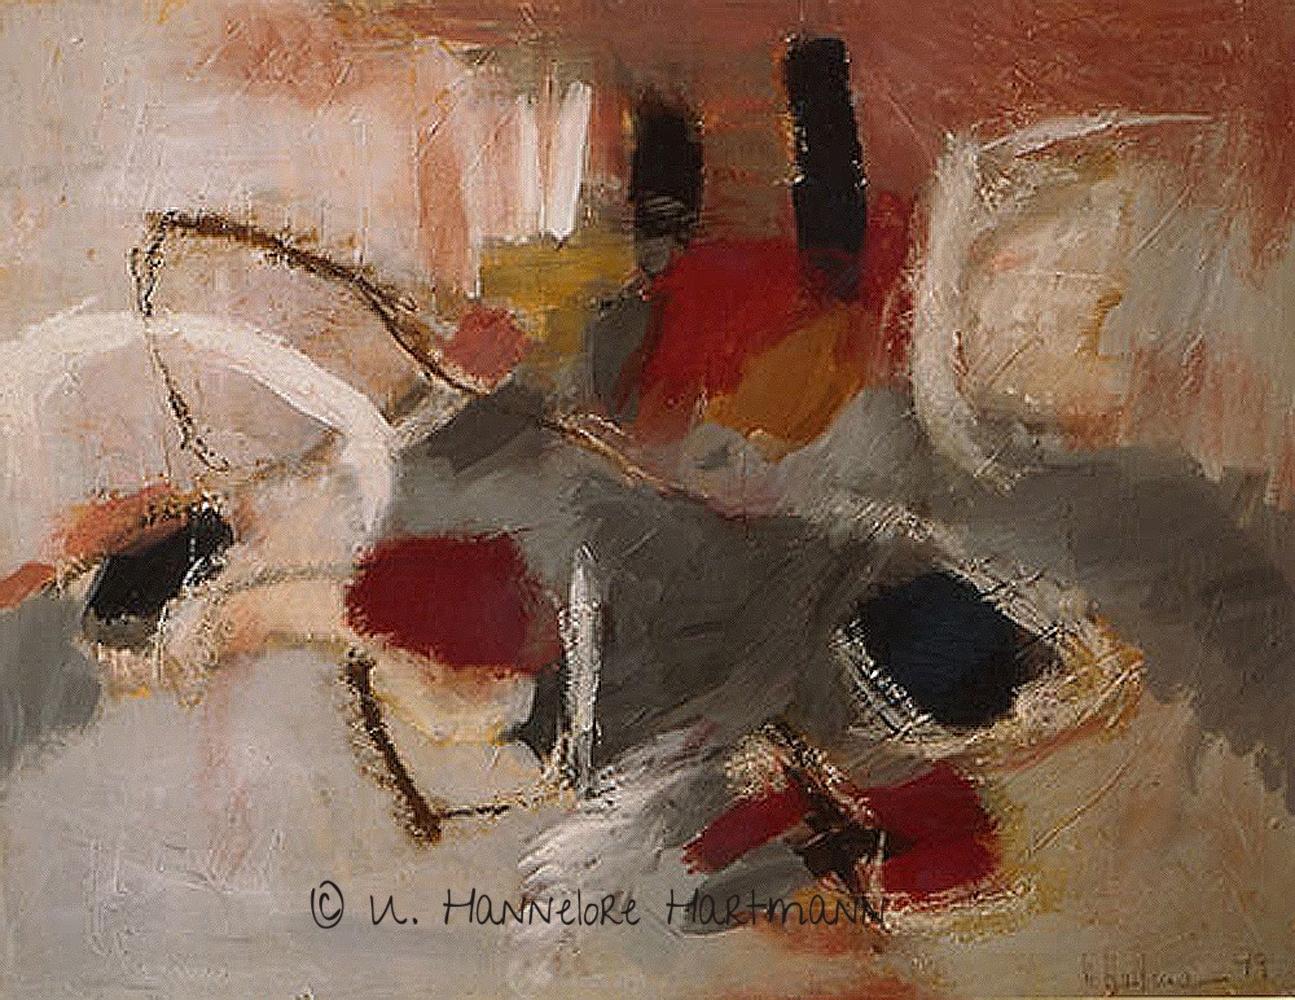 """Ohne Titel""  Acryl, Pigmente,Ölkreide auf Nessel, 80 x 100, mit Kupferrohrahmen"